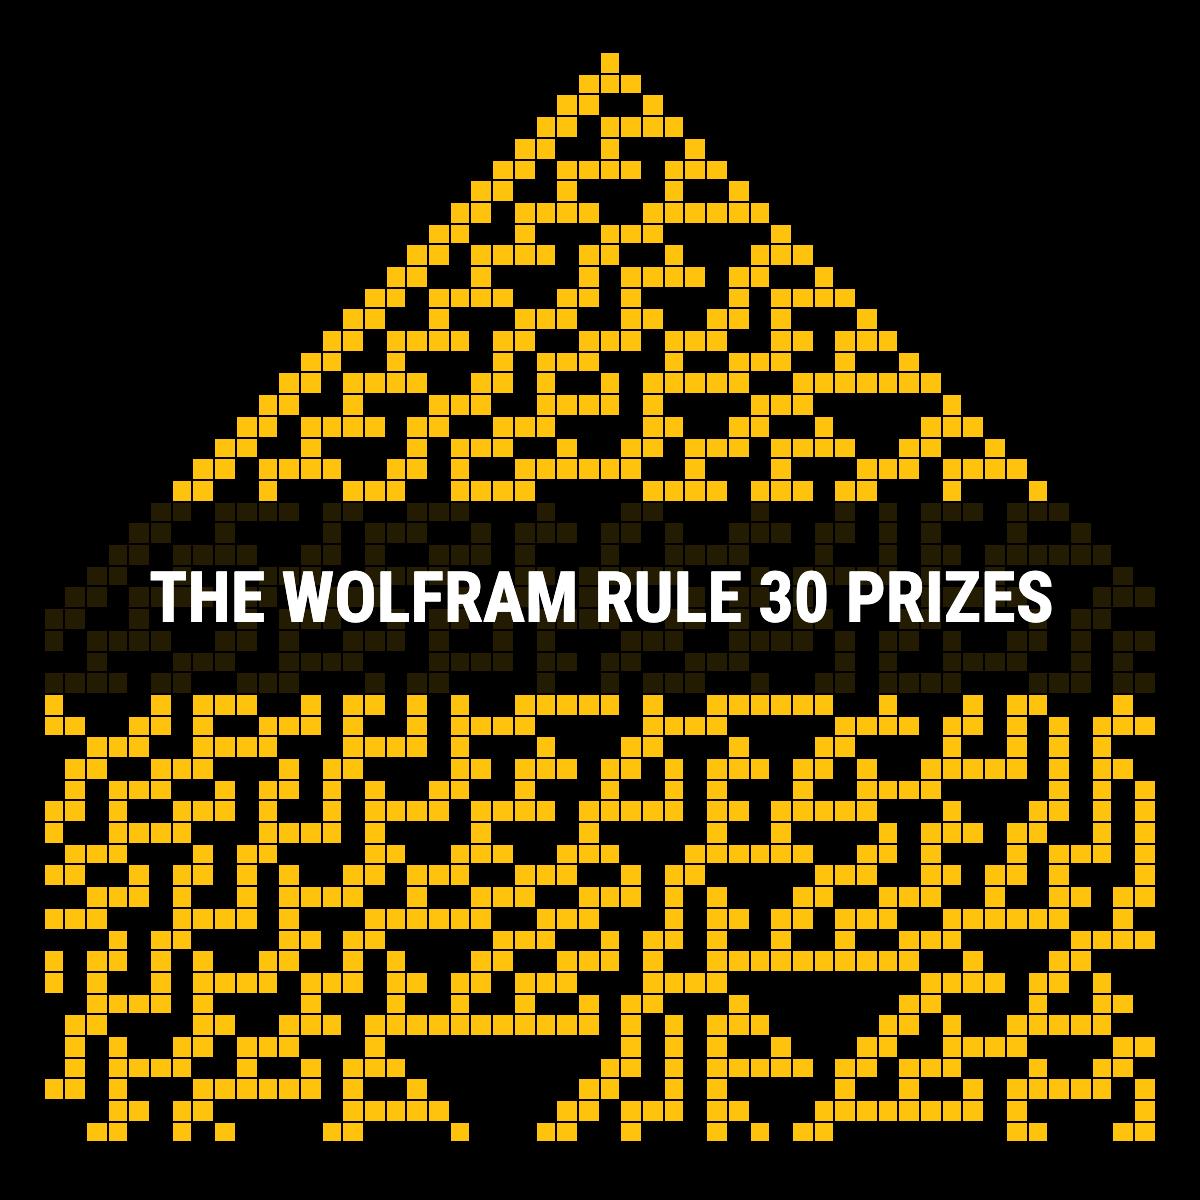 Wolfram Rule 30 Prizes